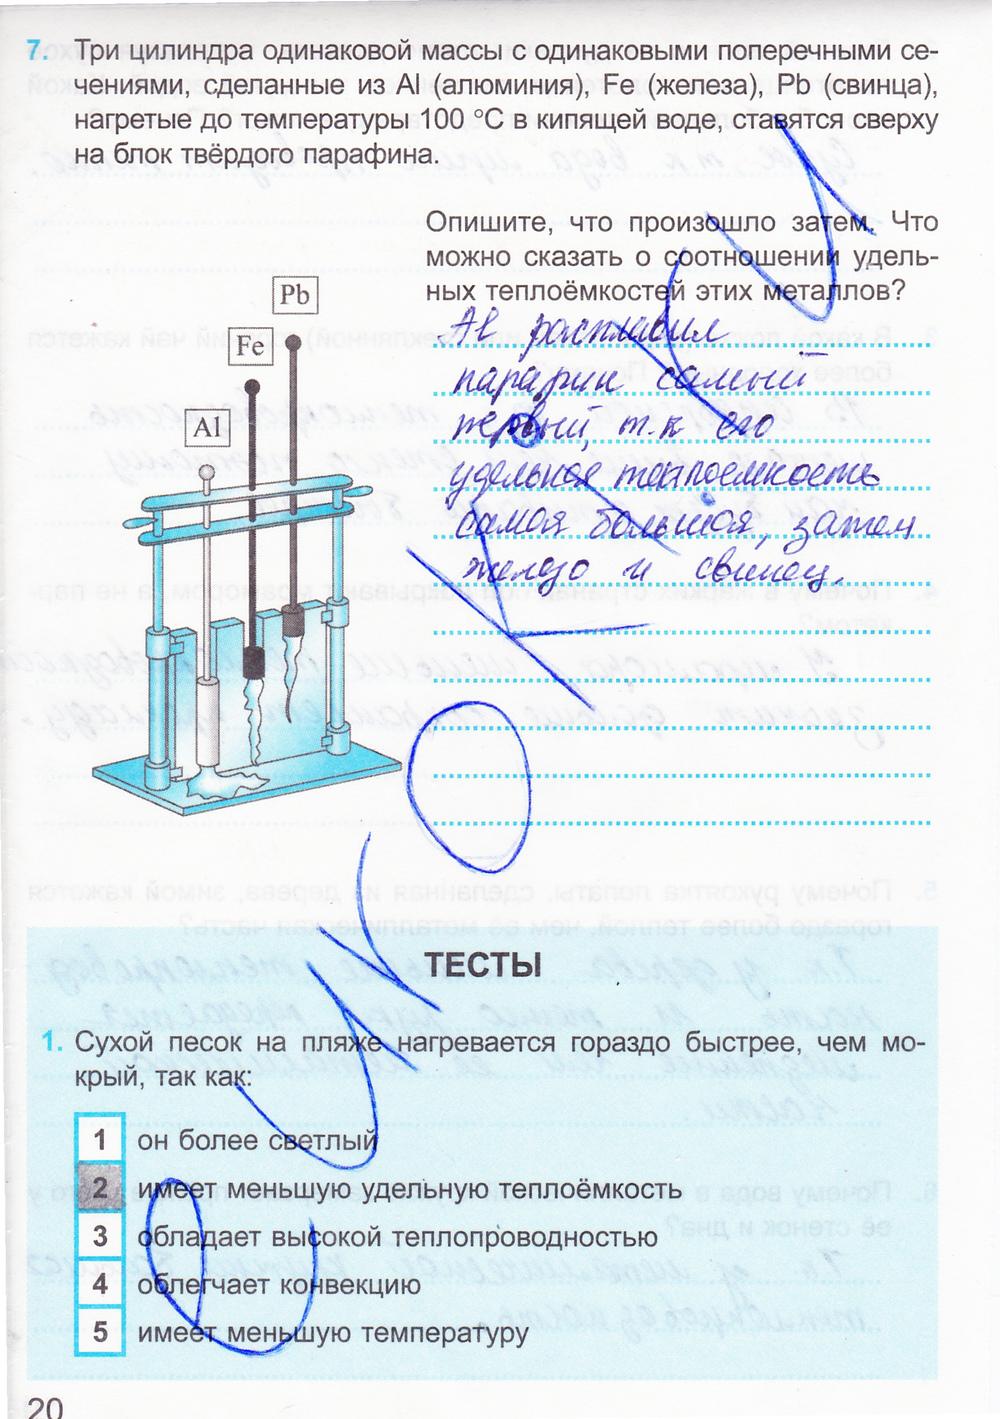 8 тетрадь физика гдз рабочая класса пёрышкин